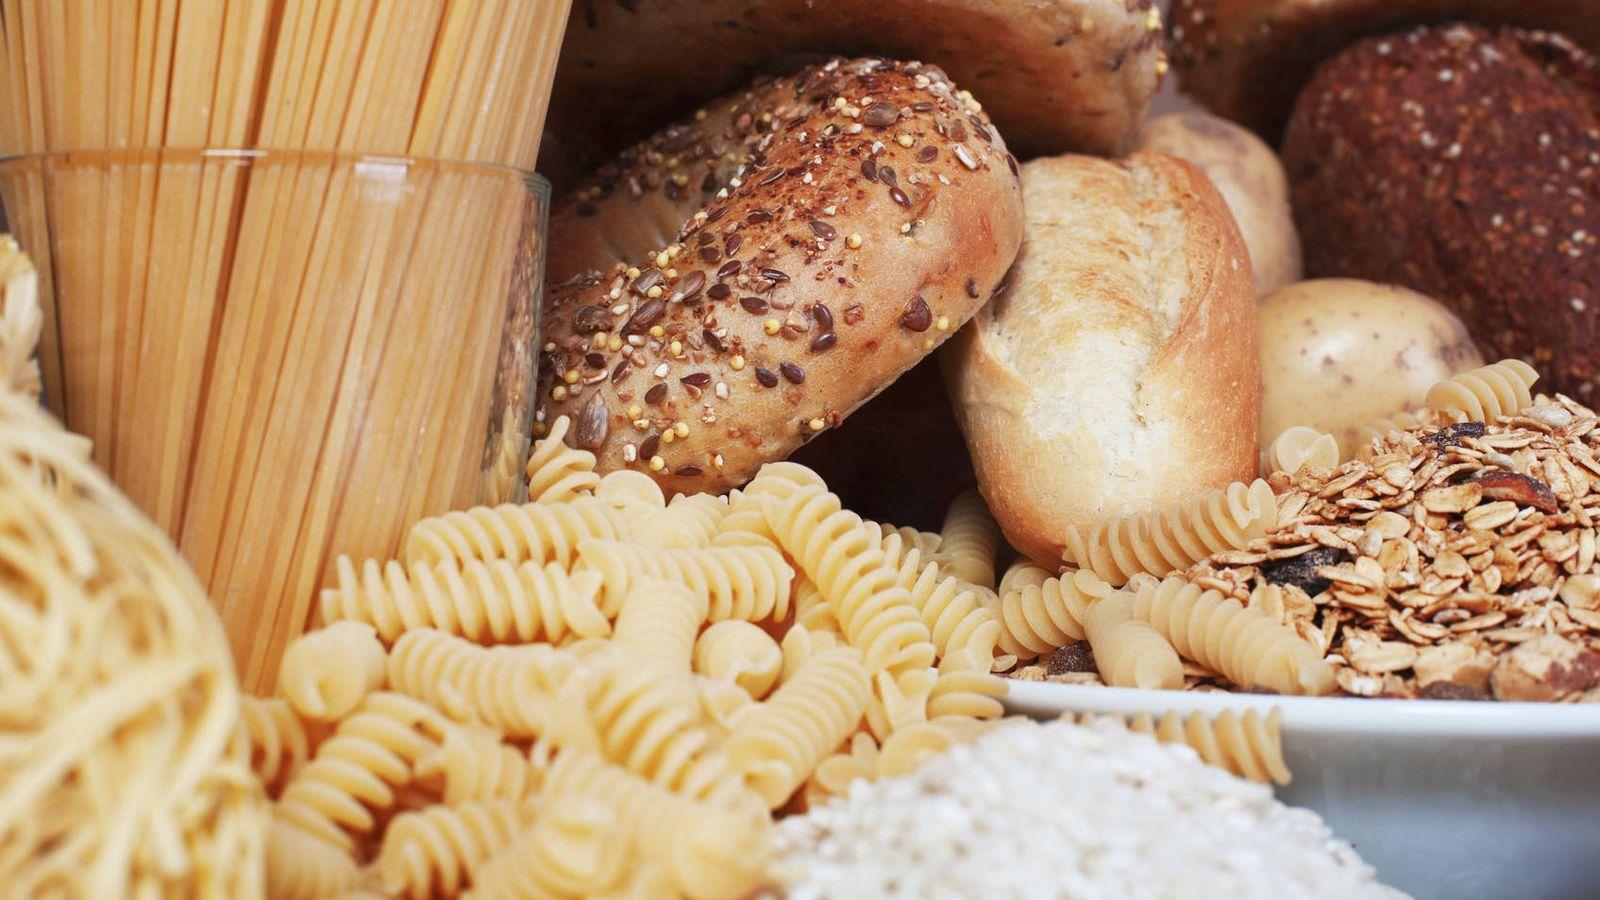 Carbohidratos Malos